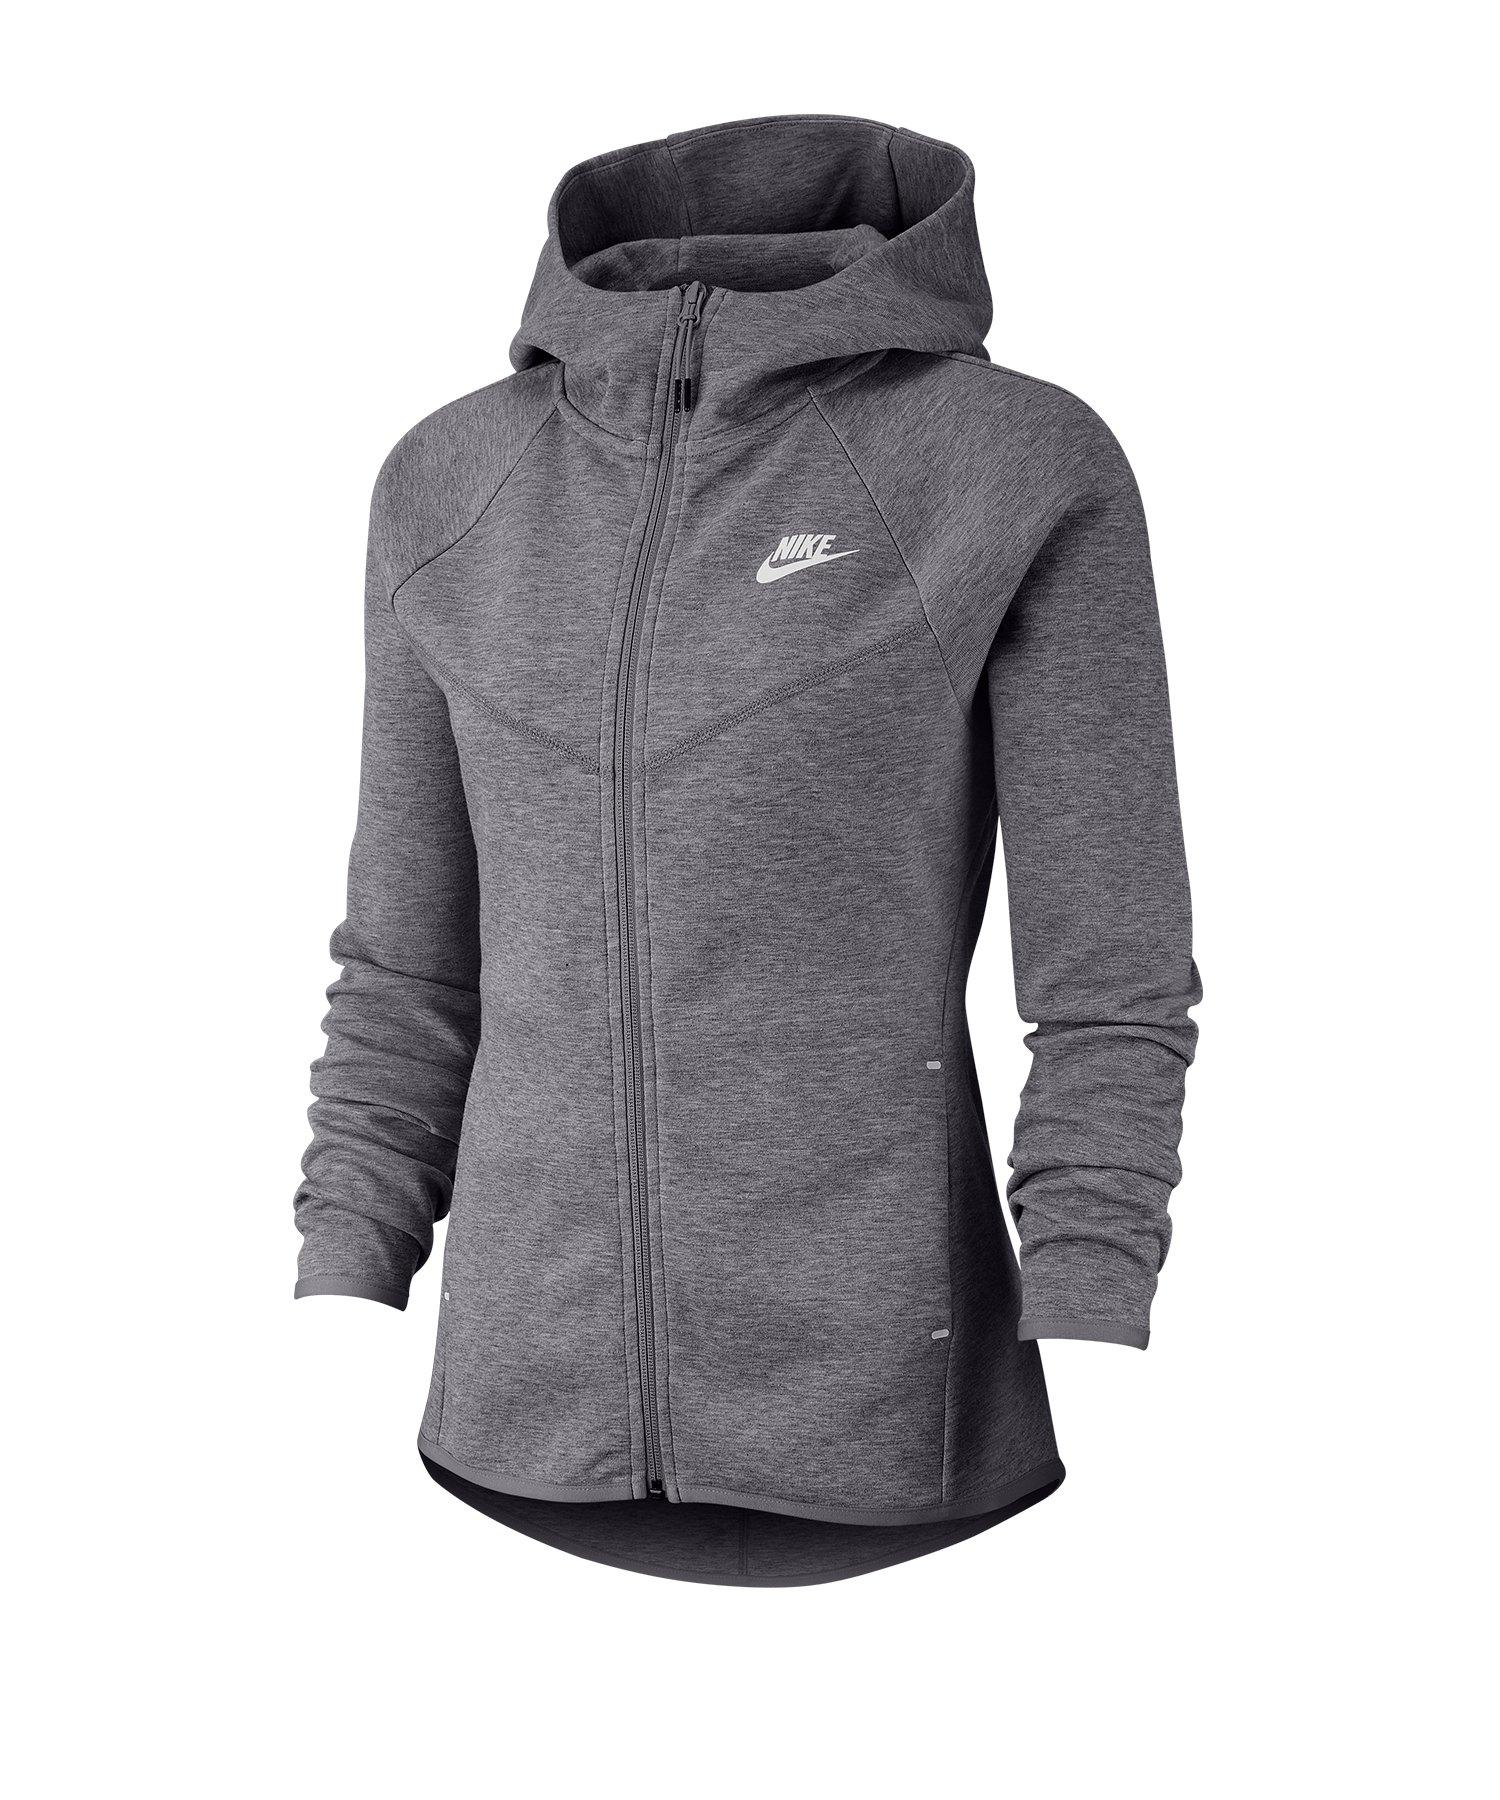 Nike Tech Fleece Kapuzenjacke Damen Grau F063 - grau